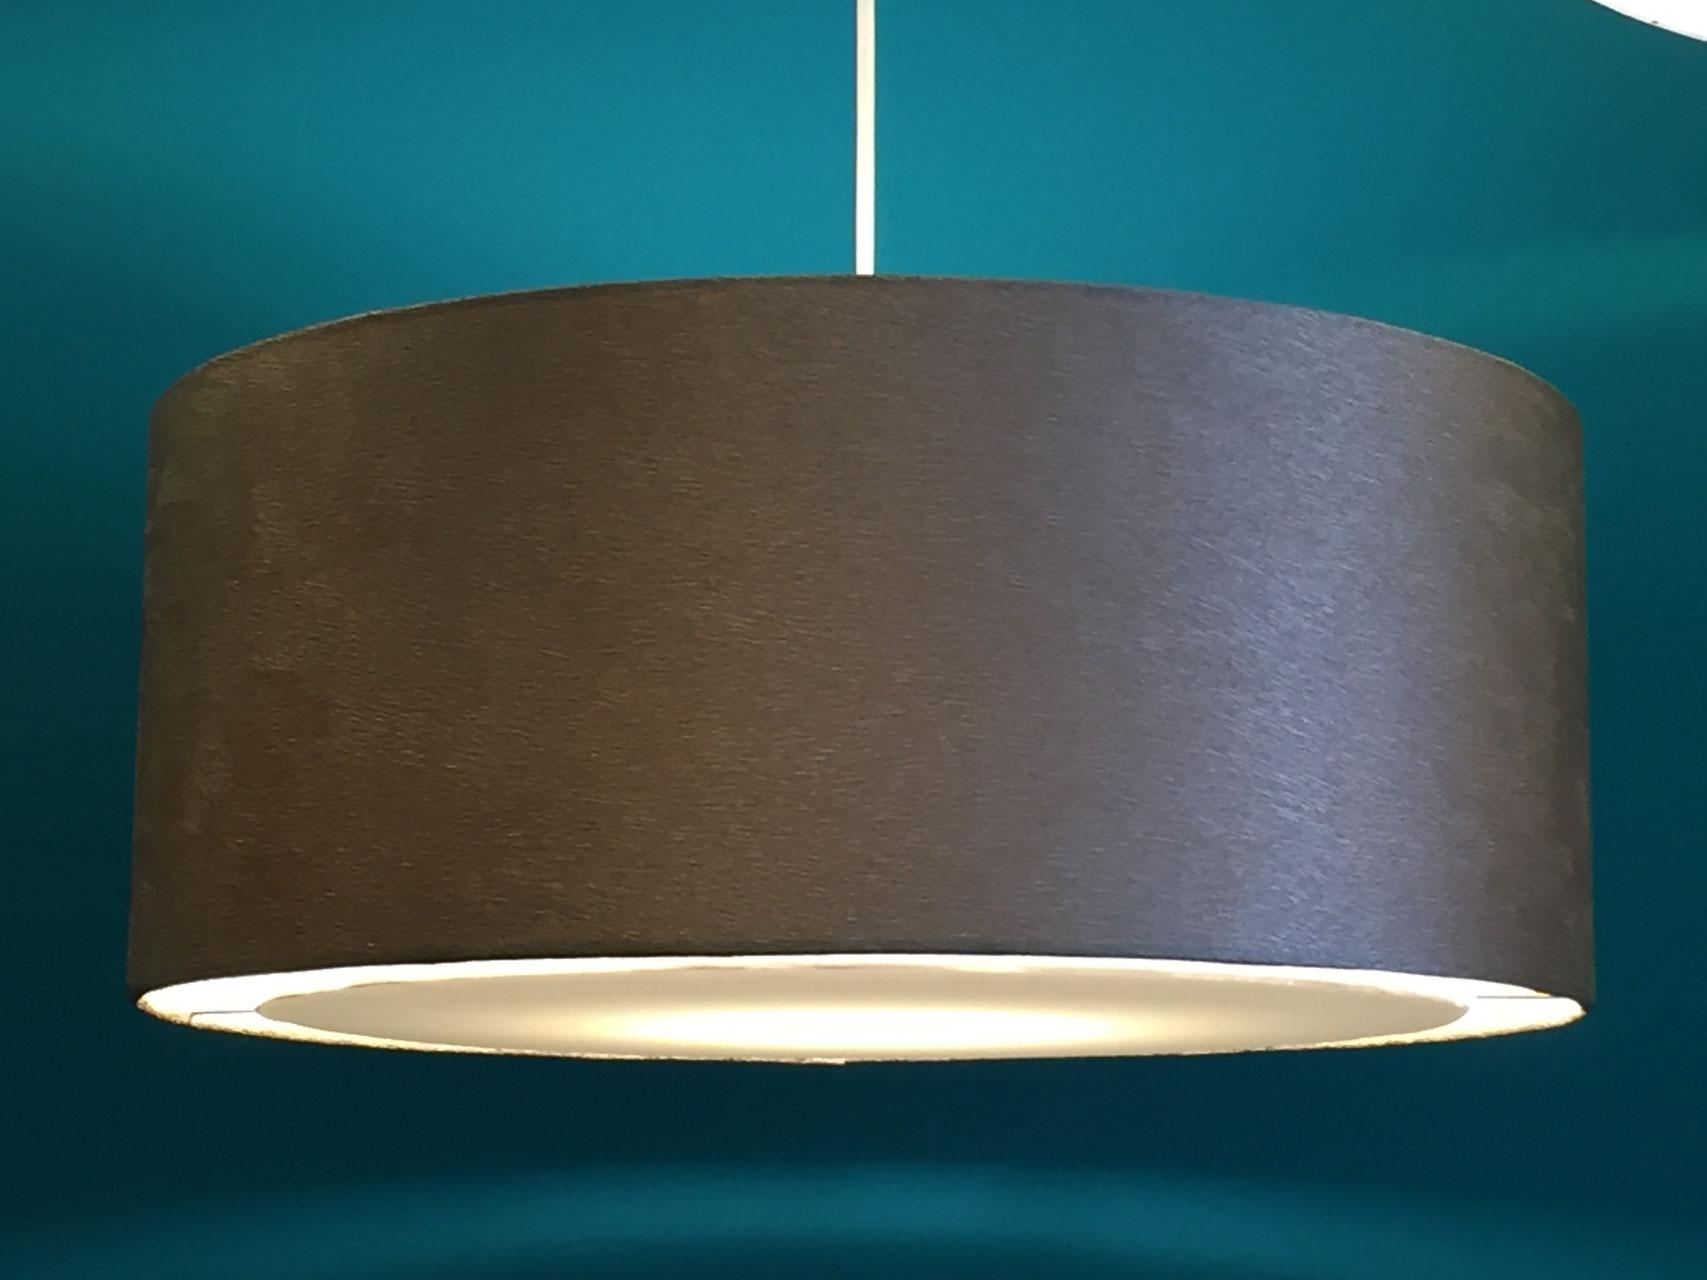 flat mylamp shop lightprodukte f r den wohnkomfort. Black Bedroom Furniture Sets. Home Design Ideas